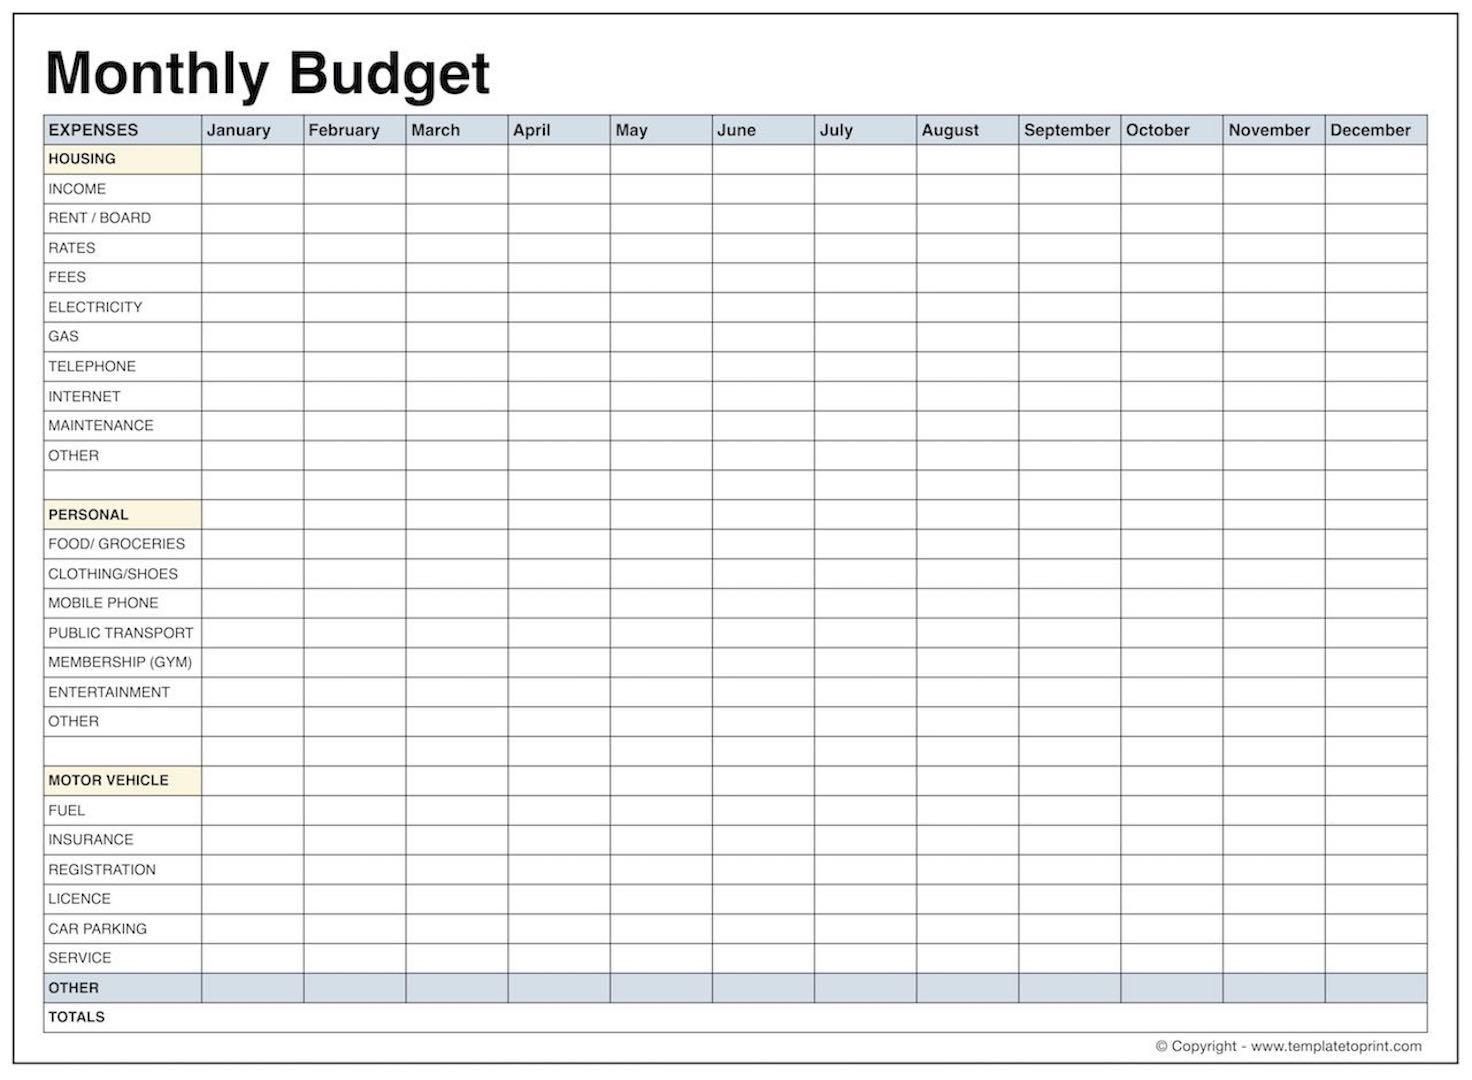 Daily Budget Worksheet Printable